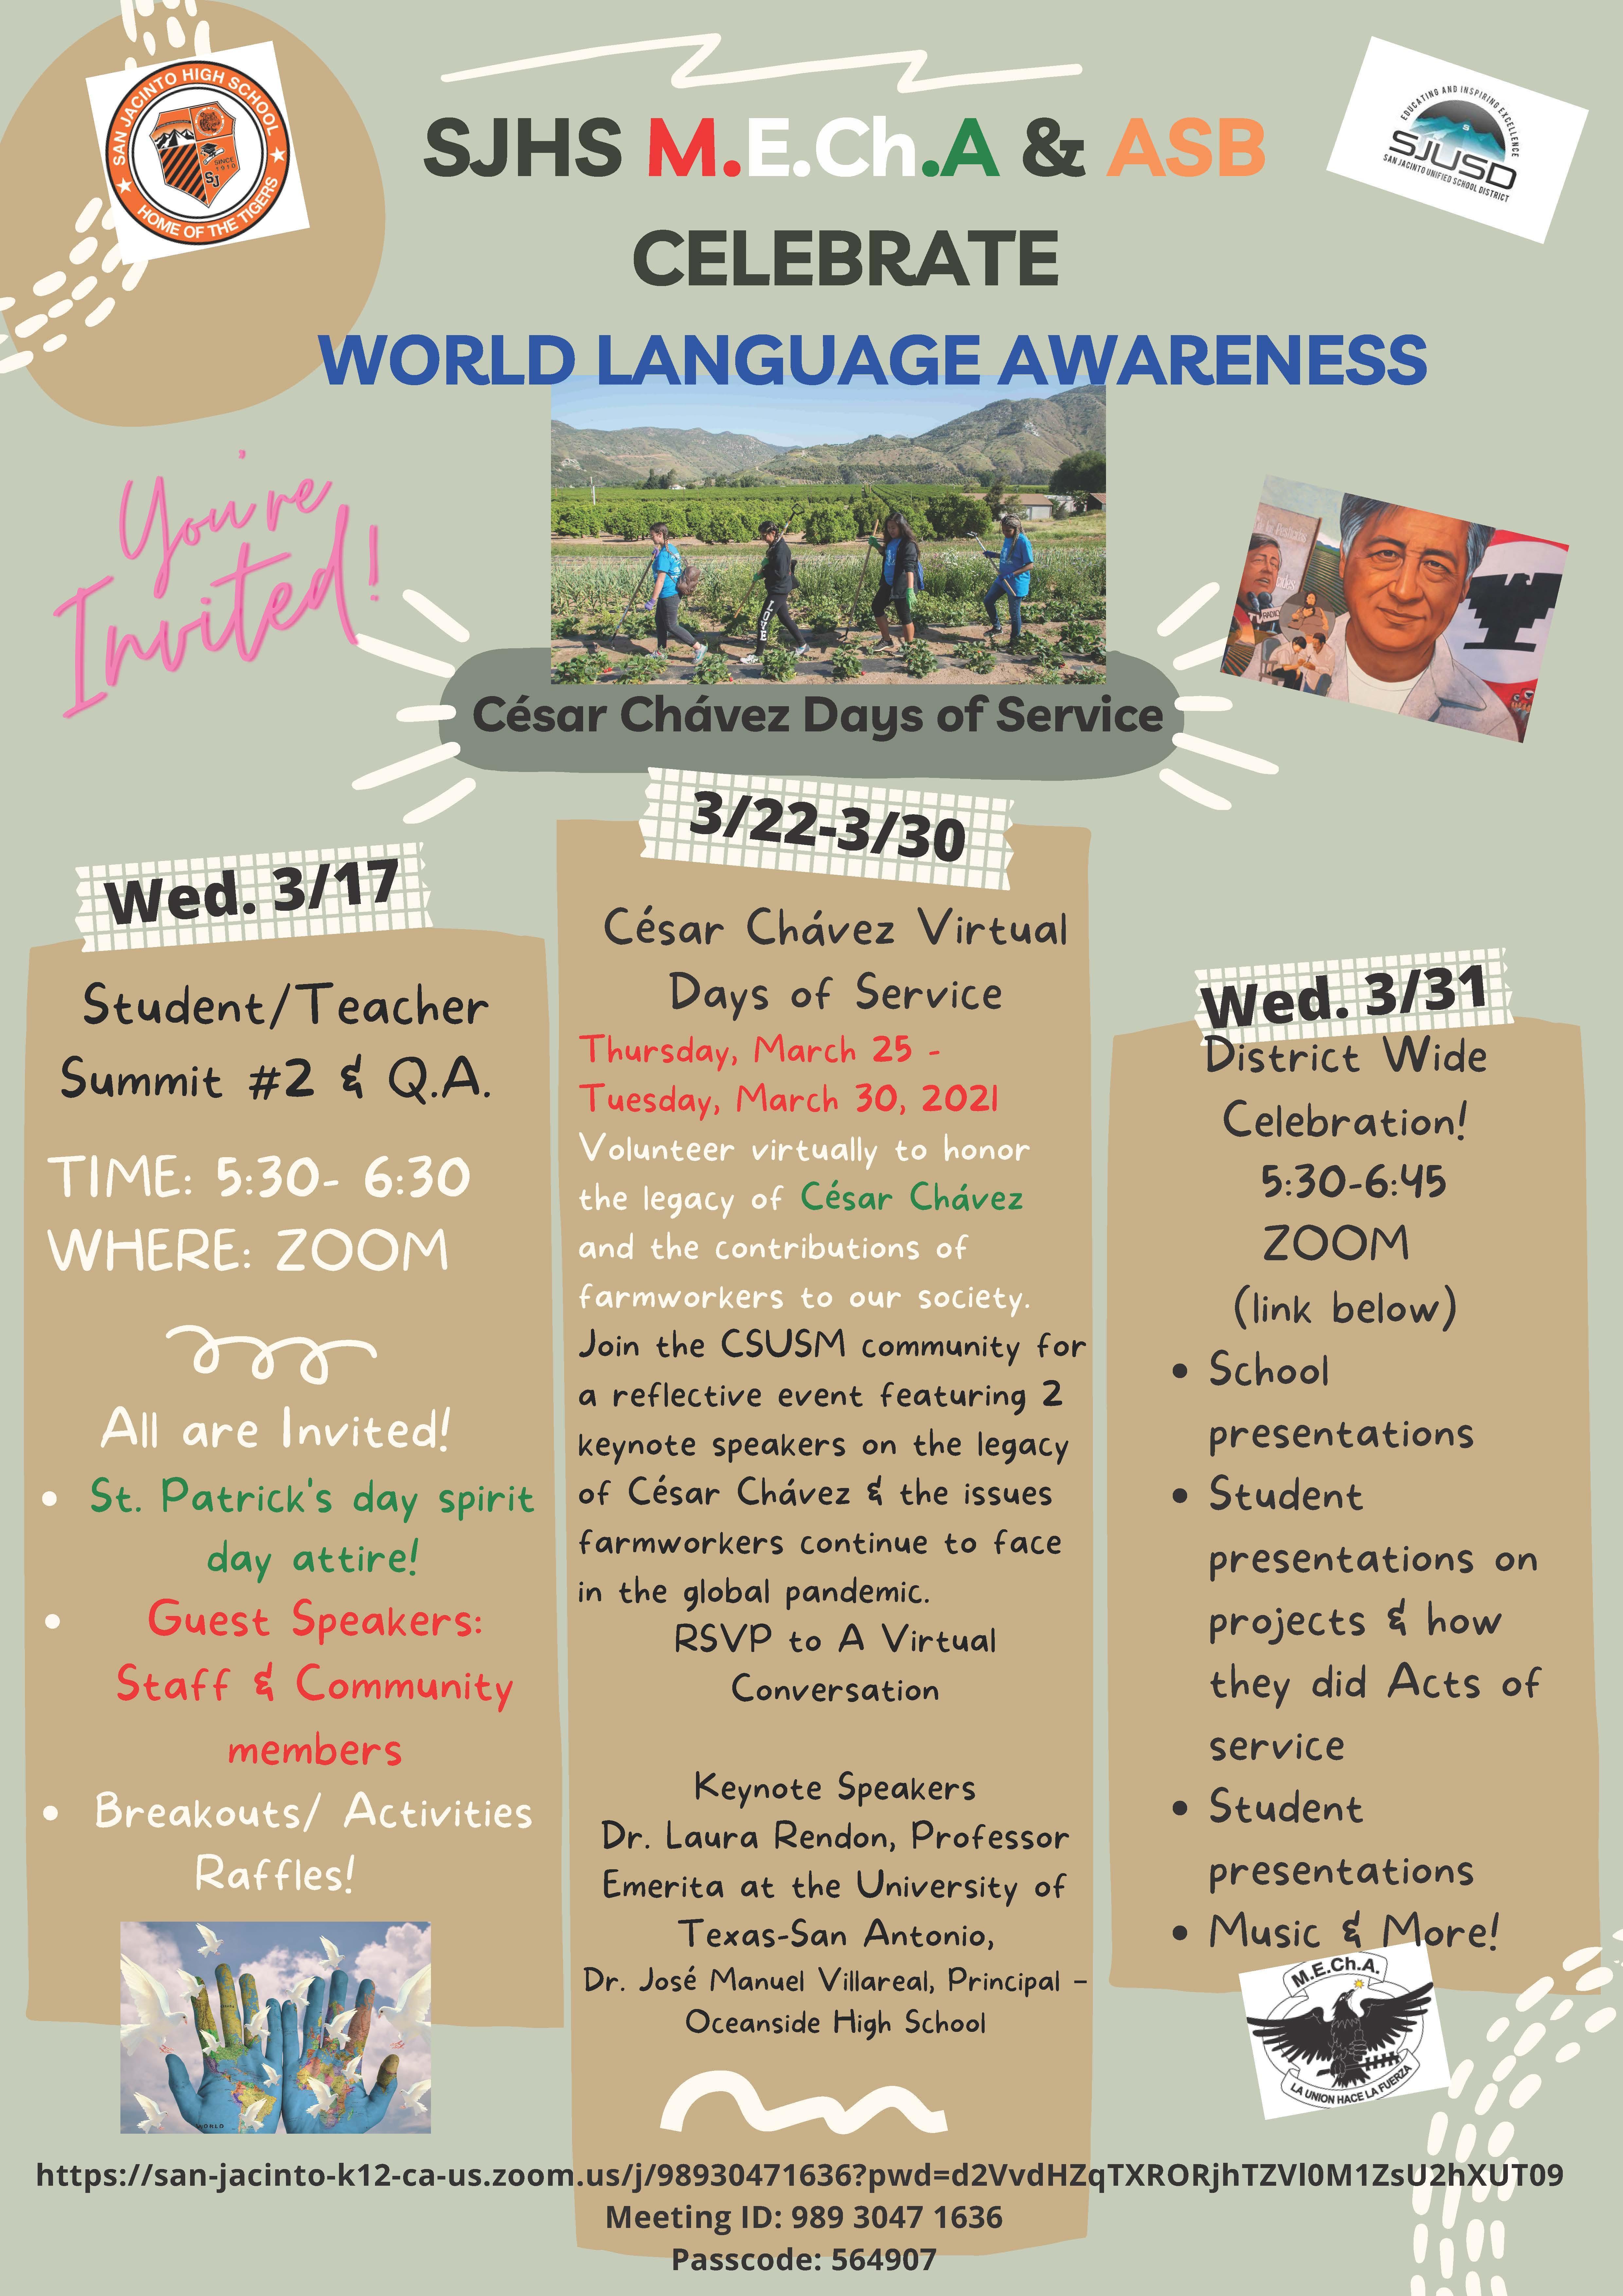 World Language Awareness Activities